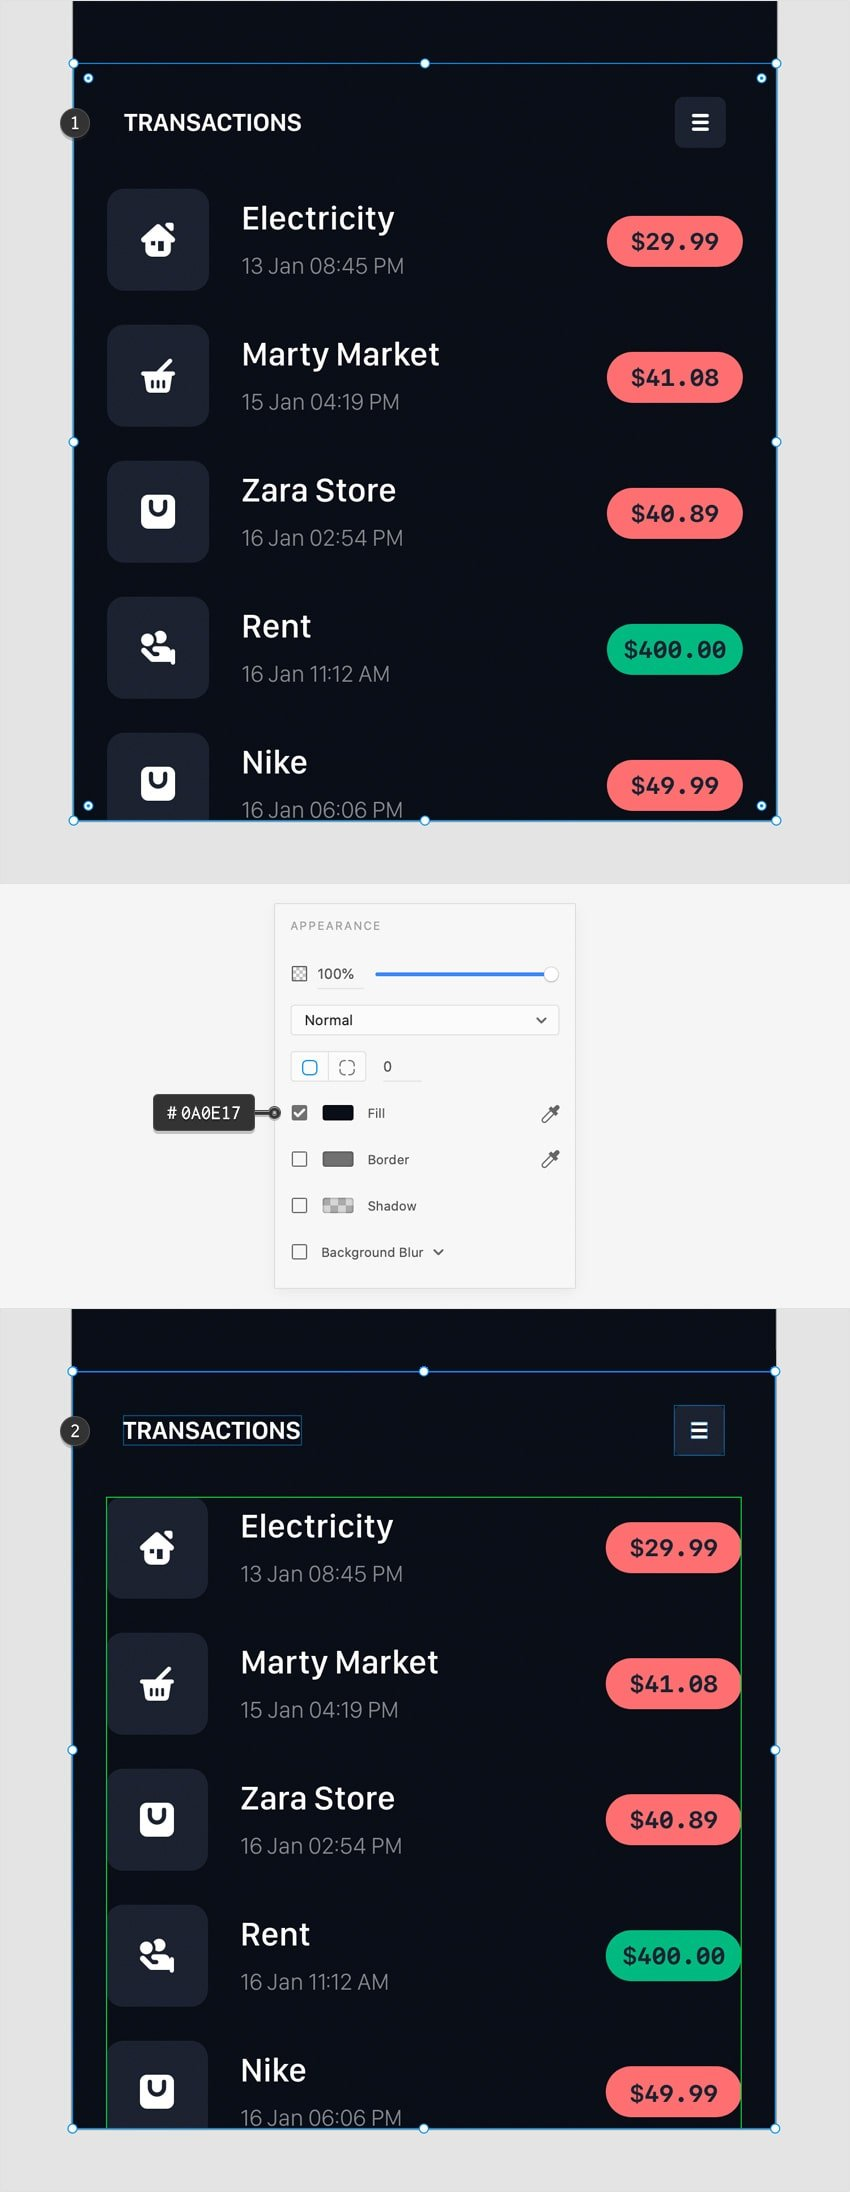 transactions bar